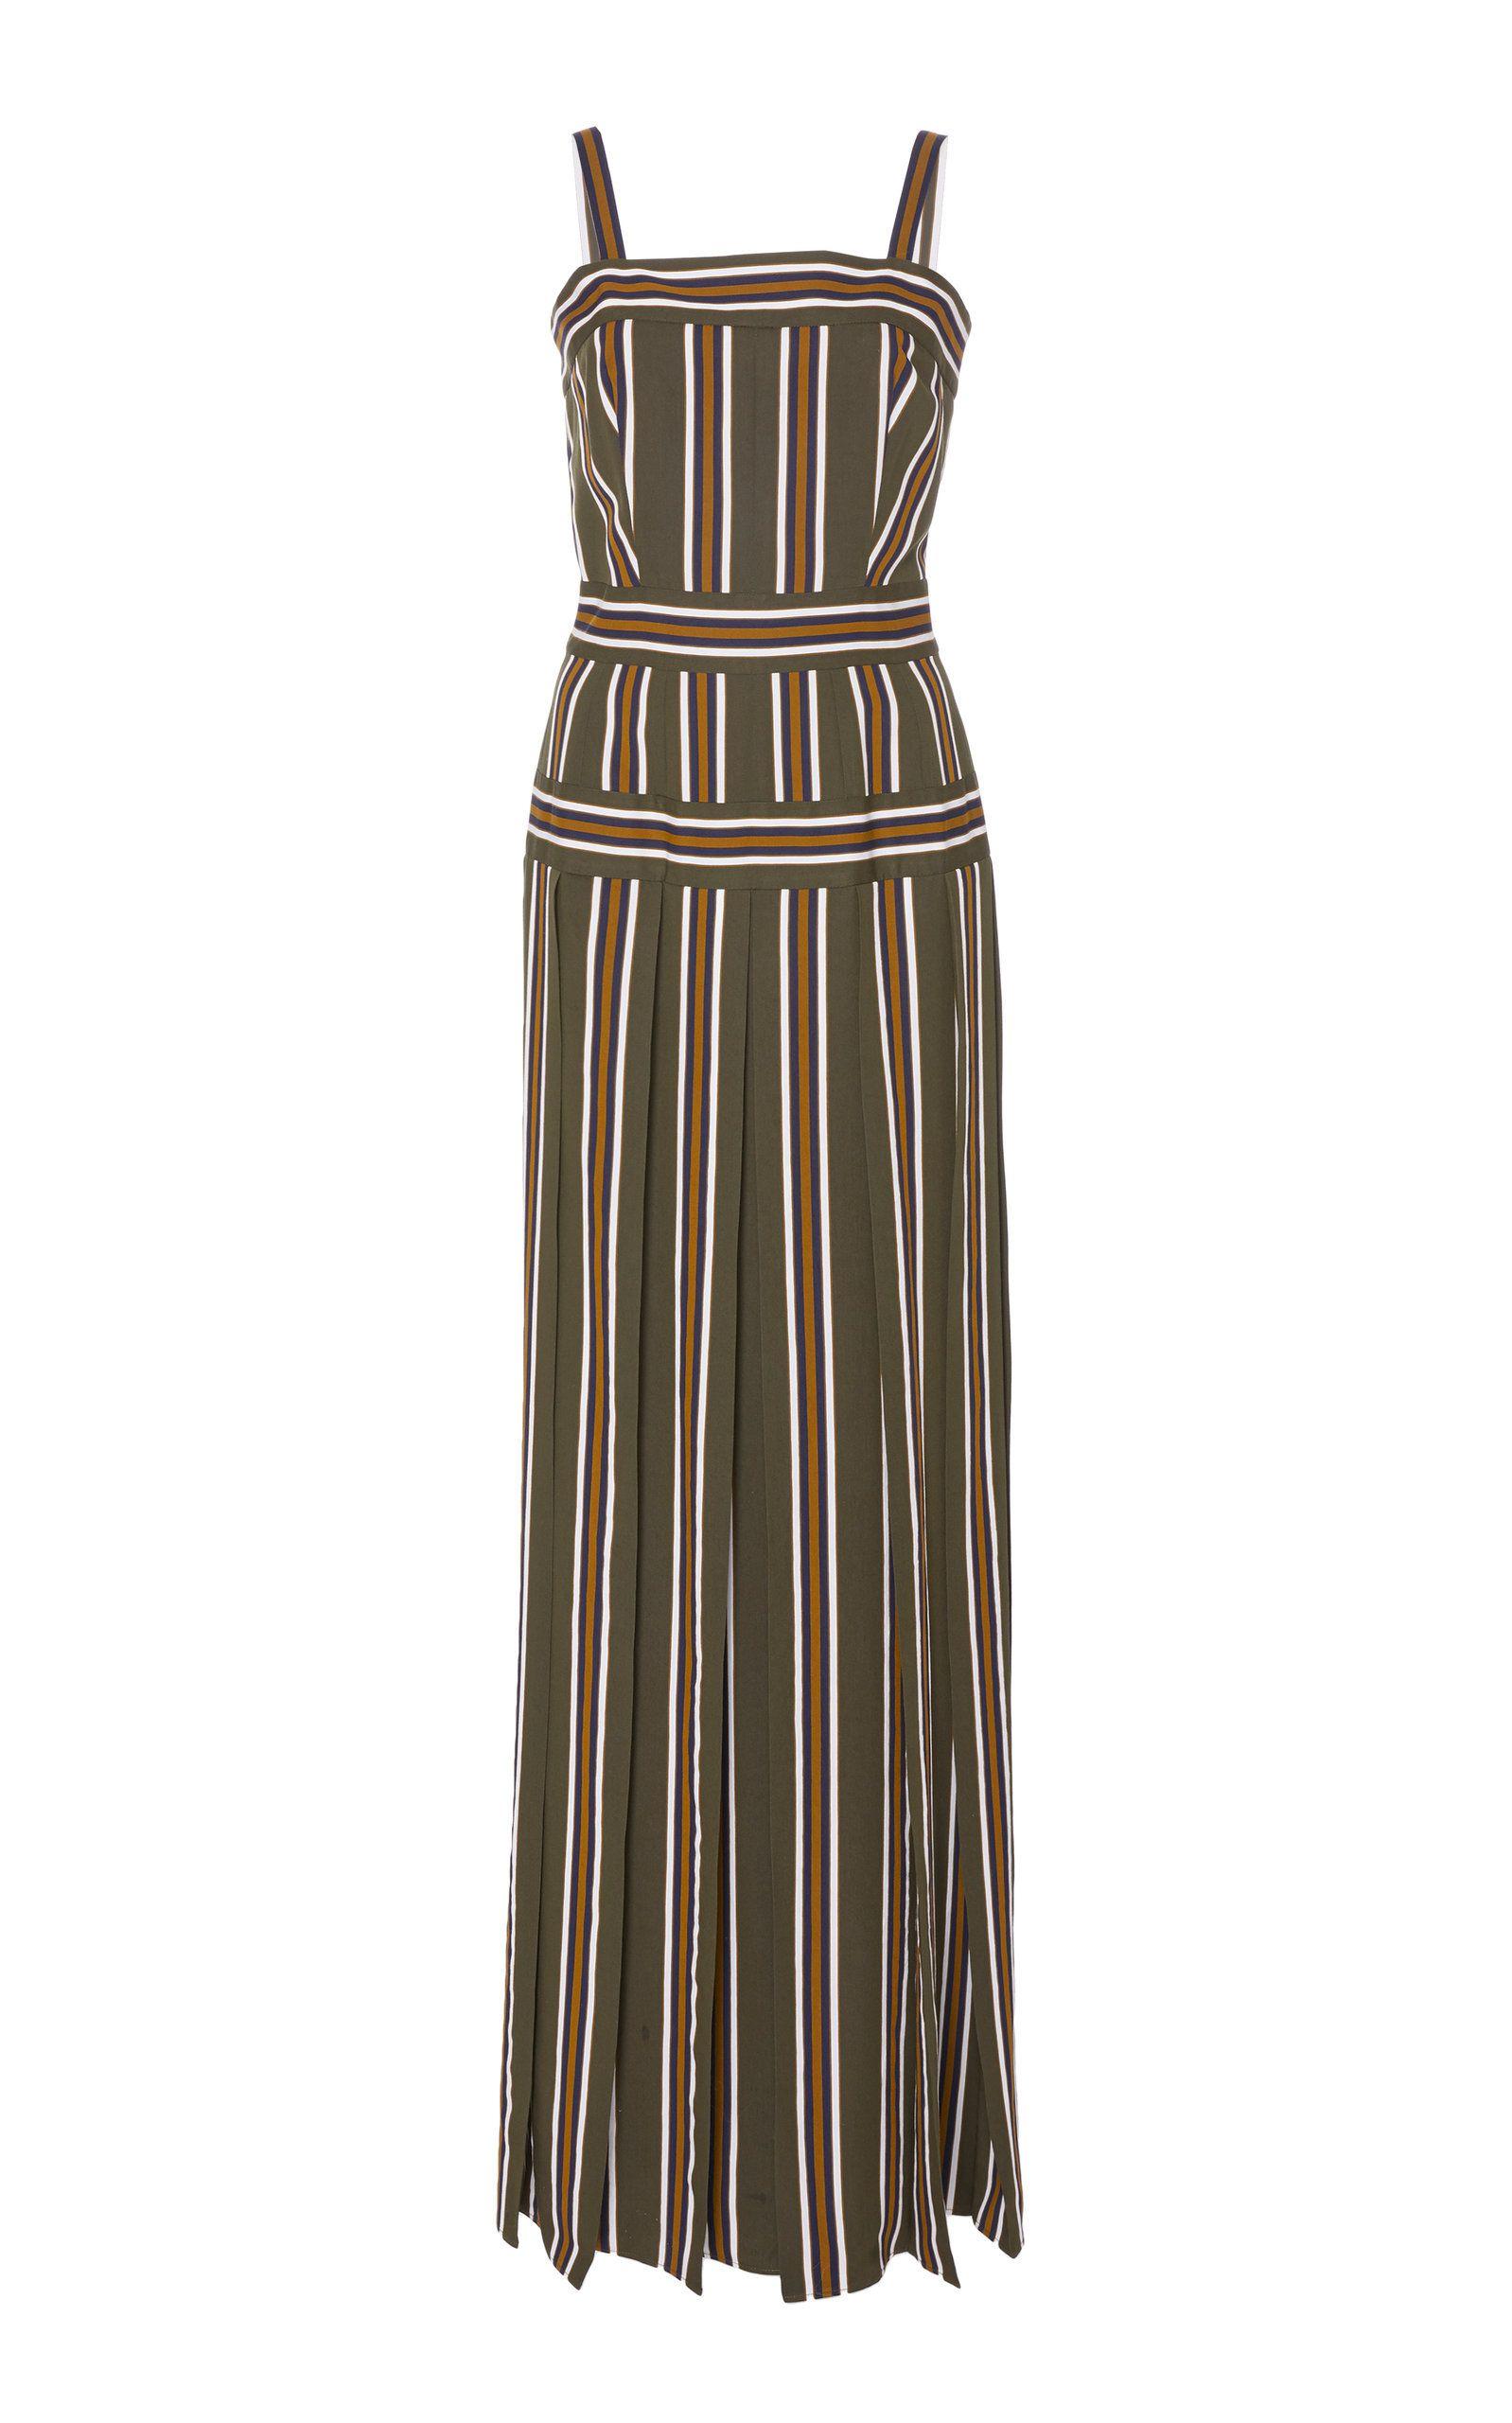 Meghan Markle Wears Martin Grant Dress At Bondi Beach